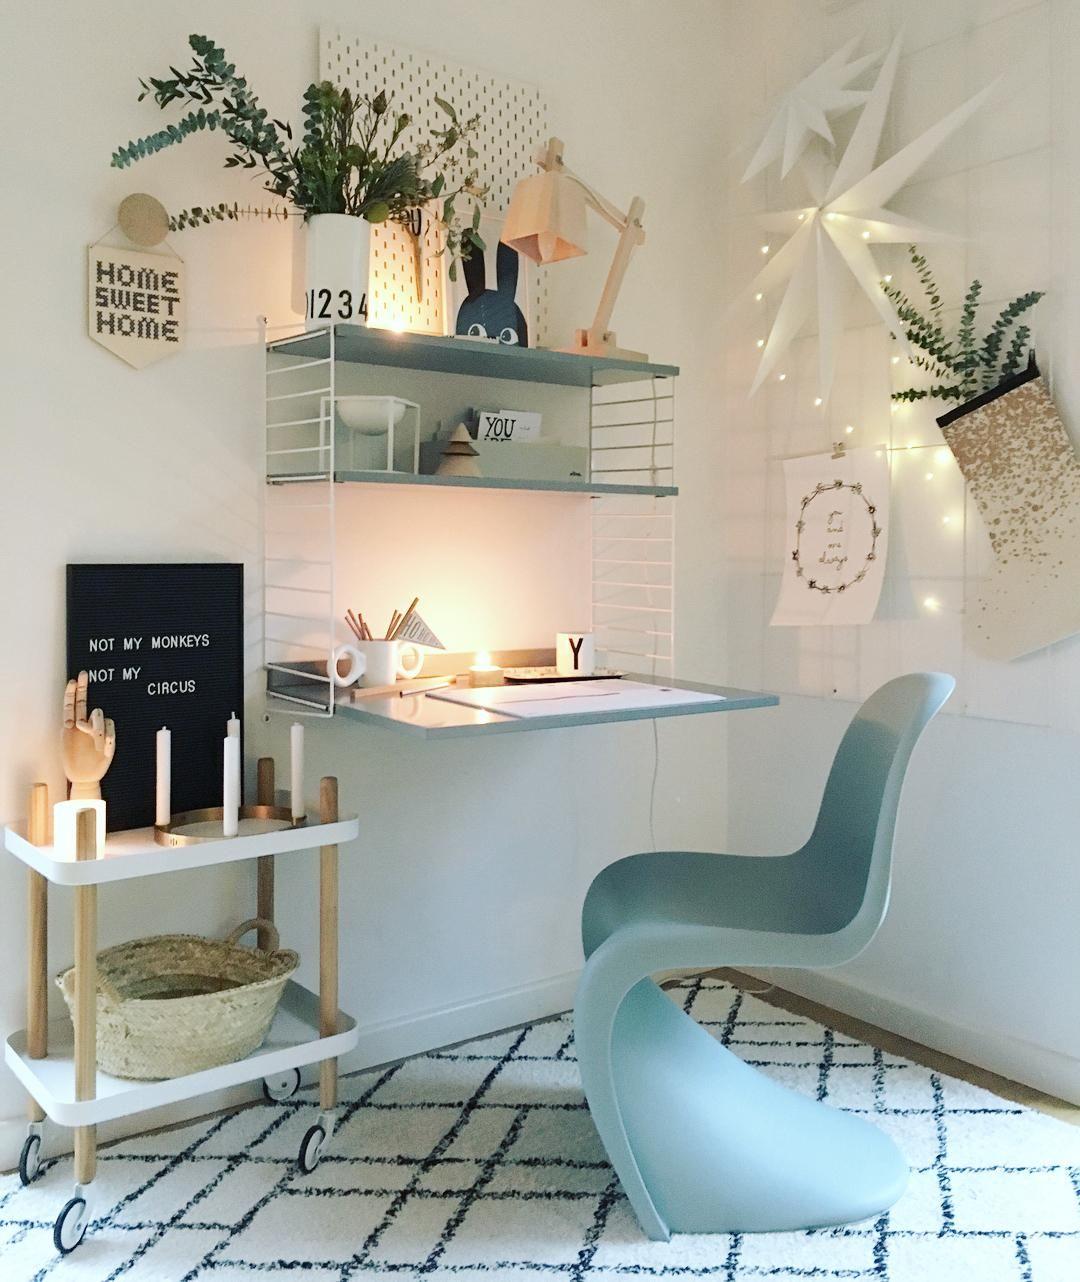 beistelltisch block ideen f r 39 s kinderzimmer deko wandgestaltung aufbewahrung etc pinterest. Black Bedroom Furniture Sets. Home Design Ideas